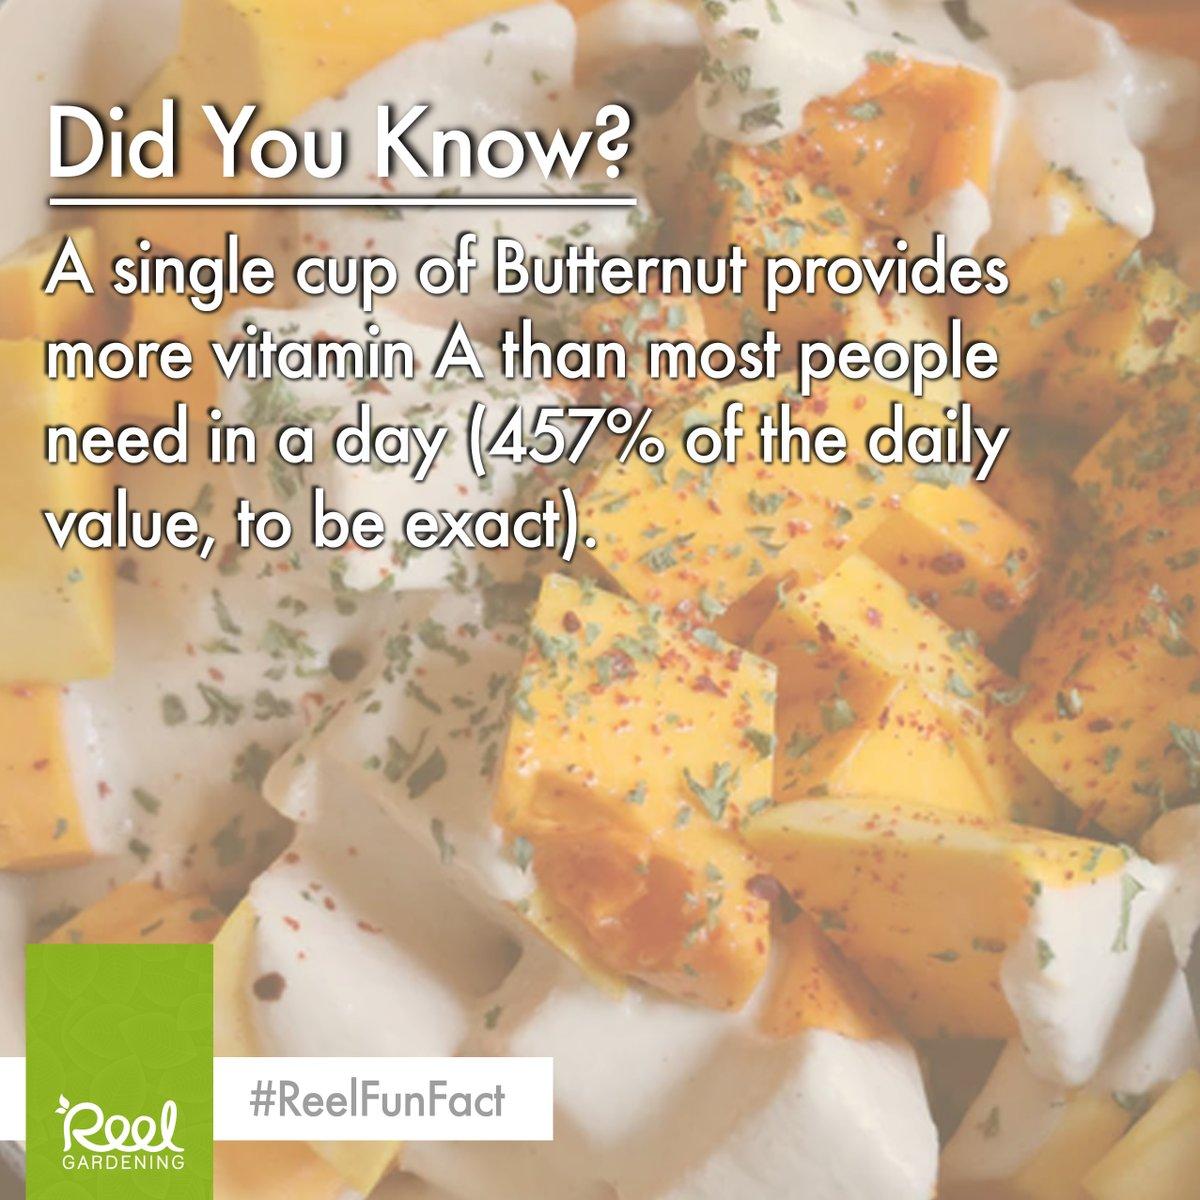 Did you know....  #butternut  #vitaminA  #vegetablegarden  #nutrition   #dailyintake  #gardening  #growyourown  #edible  #vegetable  #fruit  #vegetables  #plants  #plantbased  #food  #fact  #ReelFunFact   This fun fact was found on: https://foodandhealth.com/8-fun-facts-about-squash/  …